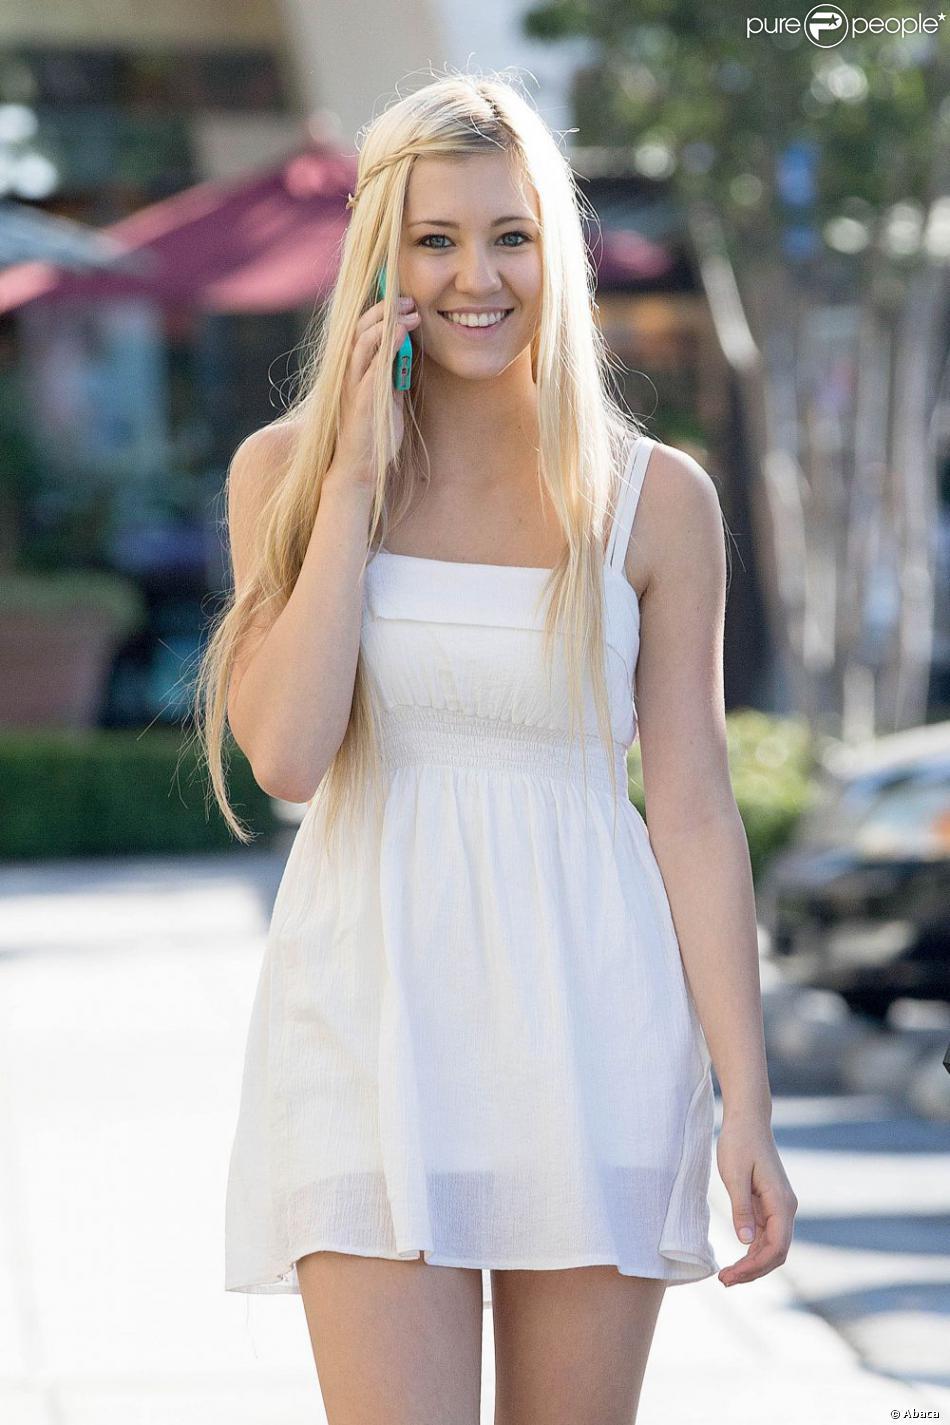 Ava Sambora, la fille d'Heather Locklear, dans les rues de Calabasas, le 7 juin 2013.